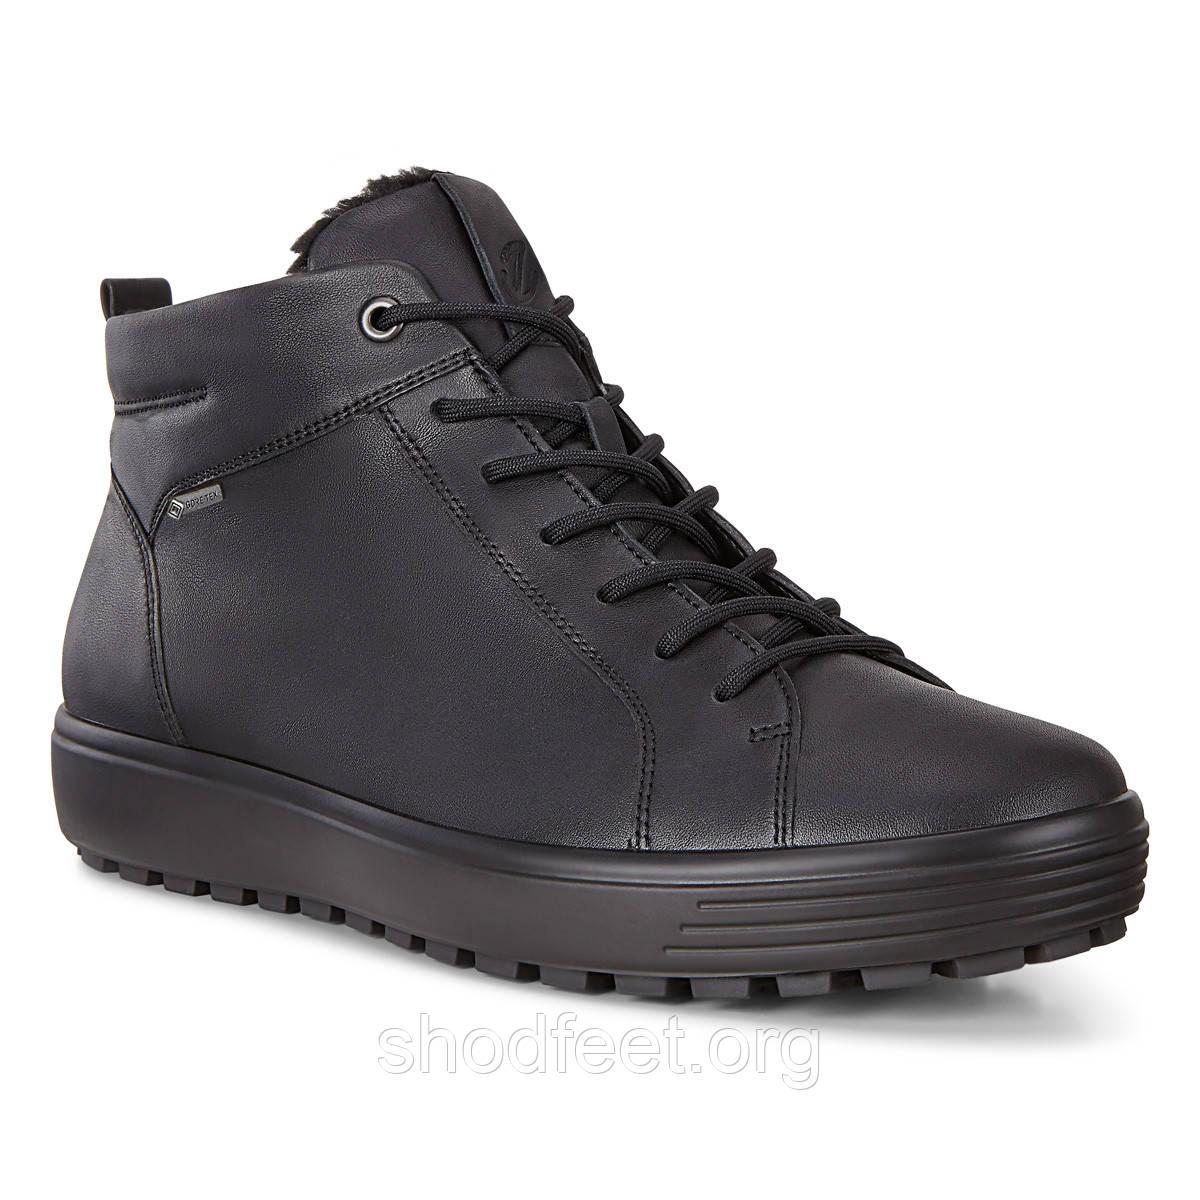 Мужские ботинки Ecco Soft 7 Tred Gore-Tex 450304-01001